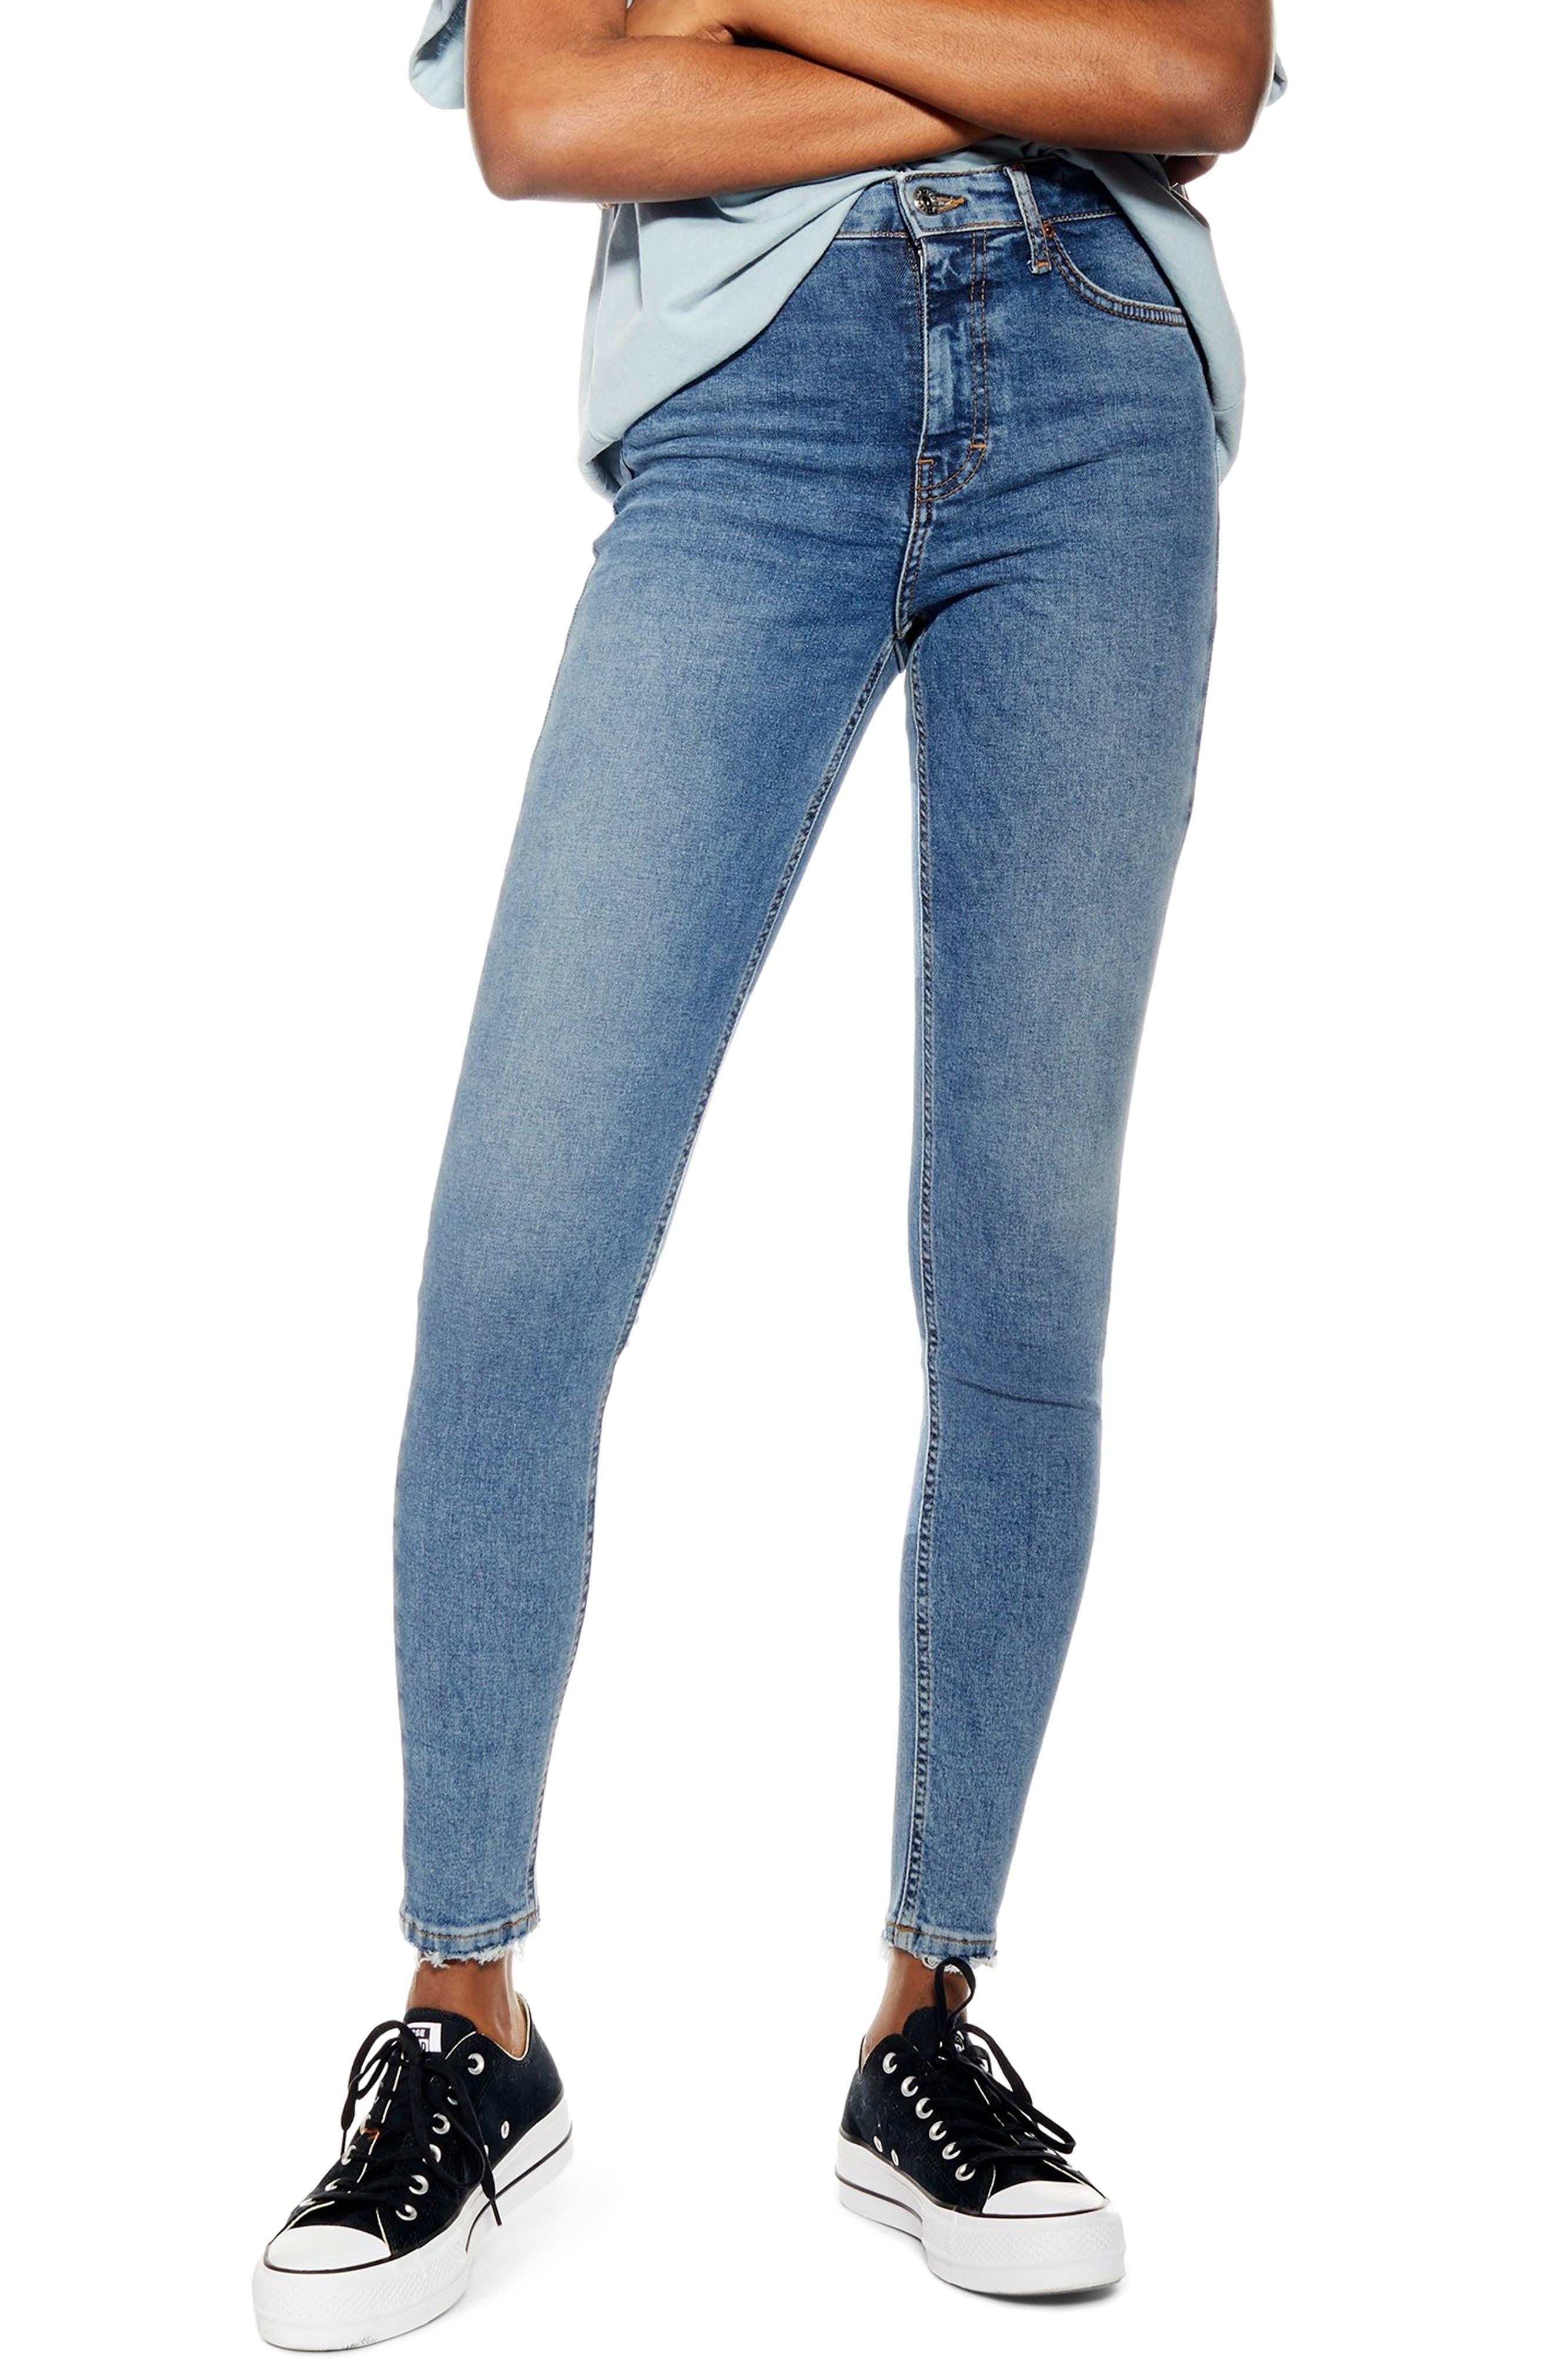 SALE /%/% BLUE EFFECT Girls Jeans Hose normal 1142-0118 grey denim NEU